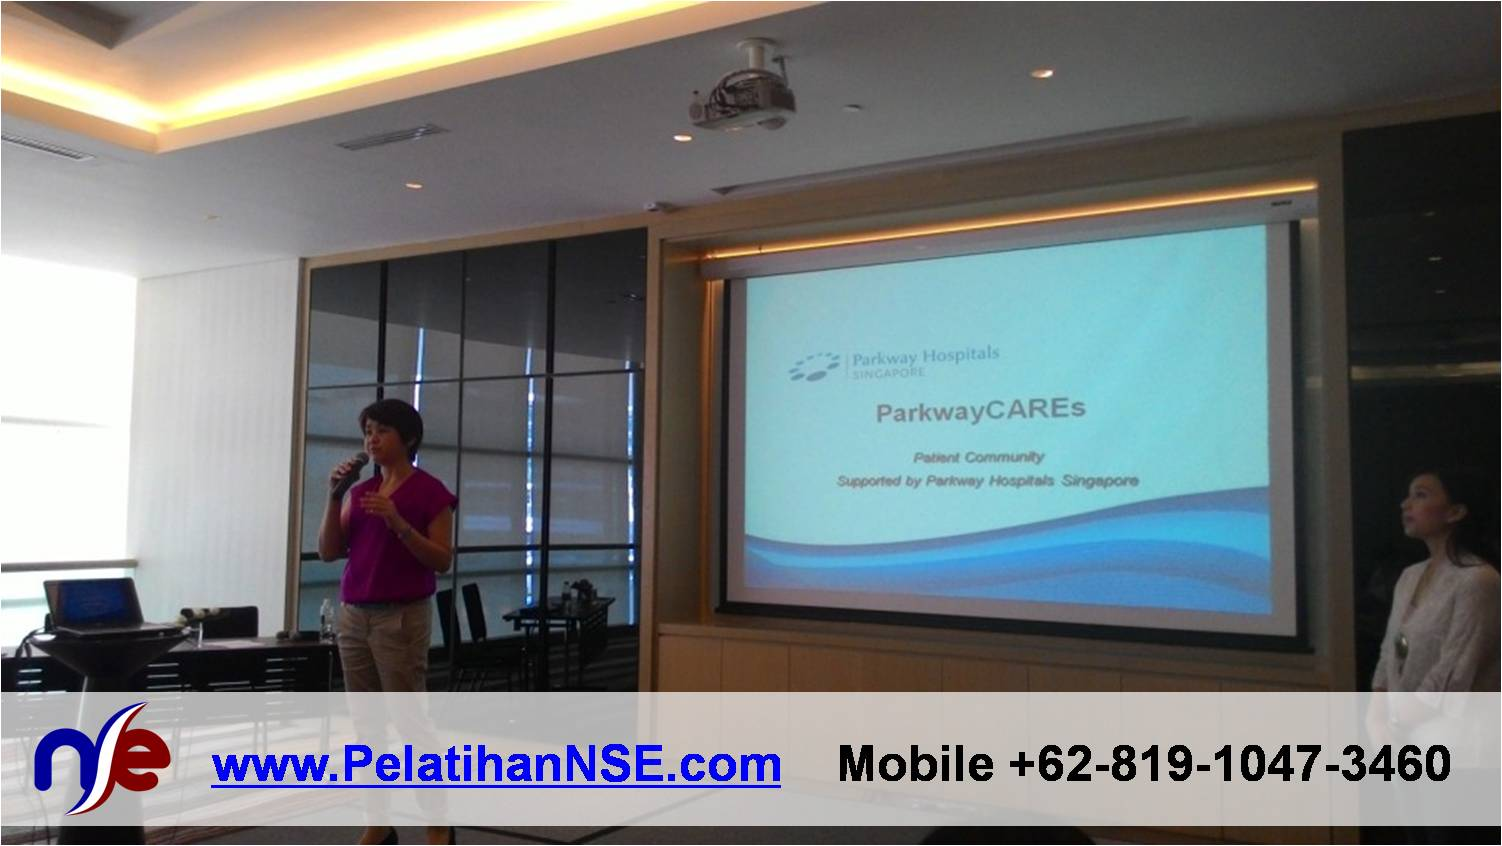 Yoga Tawa - ParkwayCAREs 30 April 2015 - Senior Manager Parkway Hospitals Ibu Diana Pratanto membuka acara